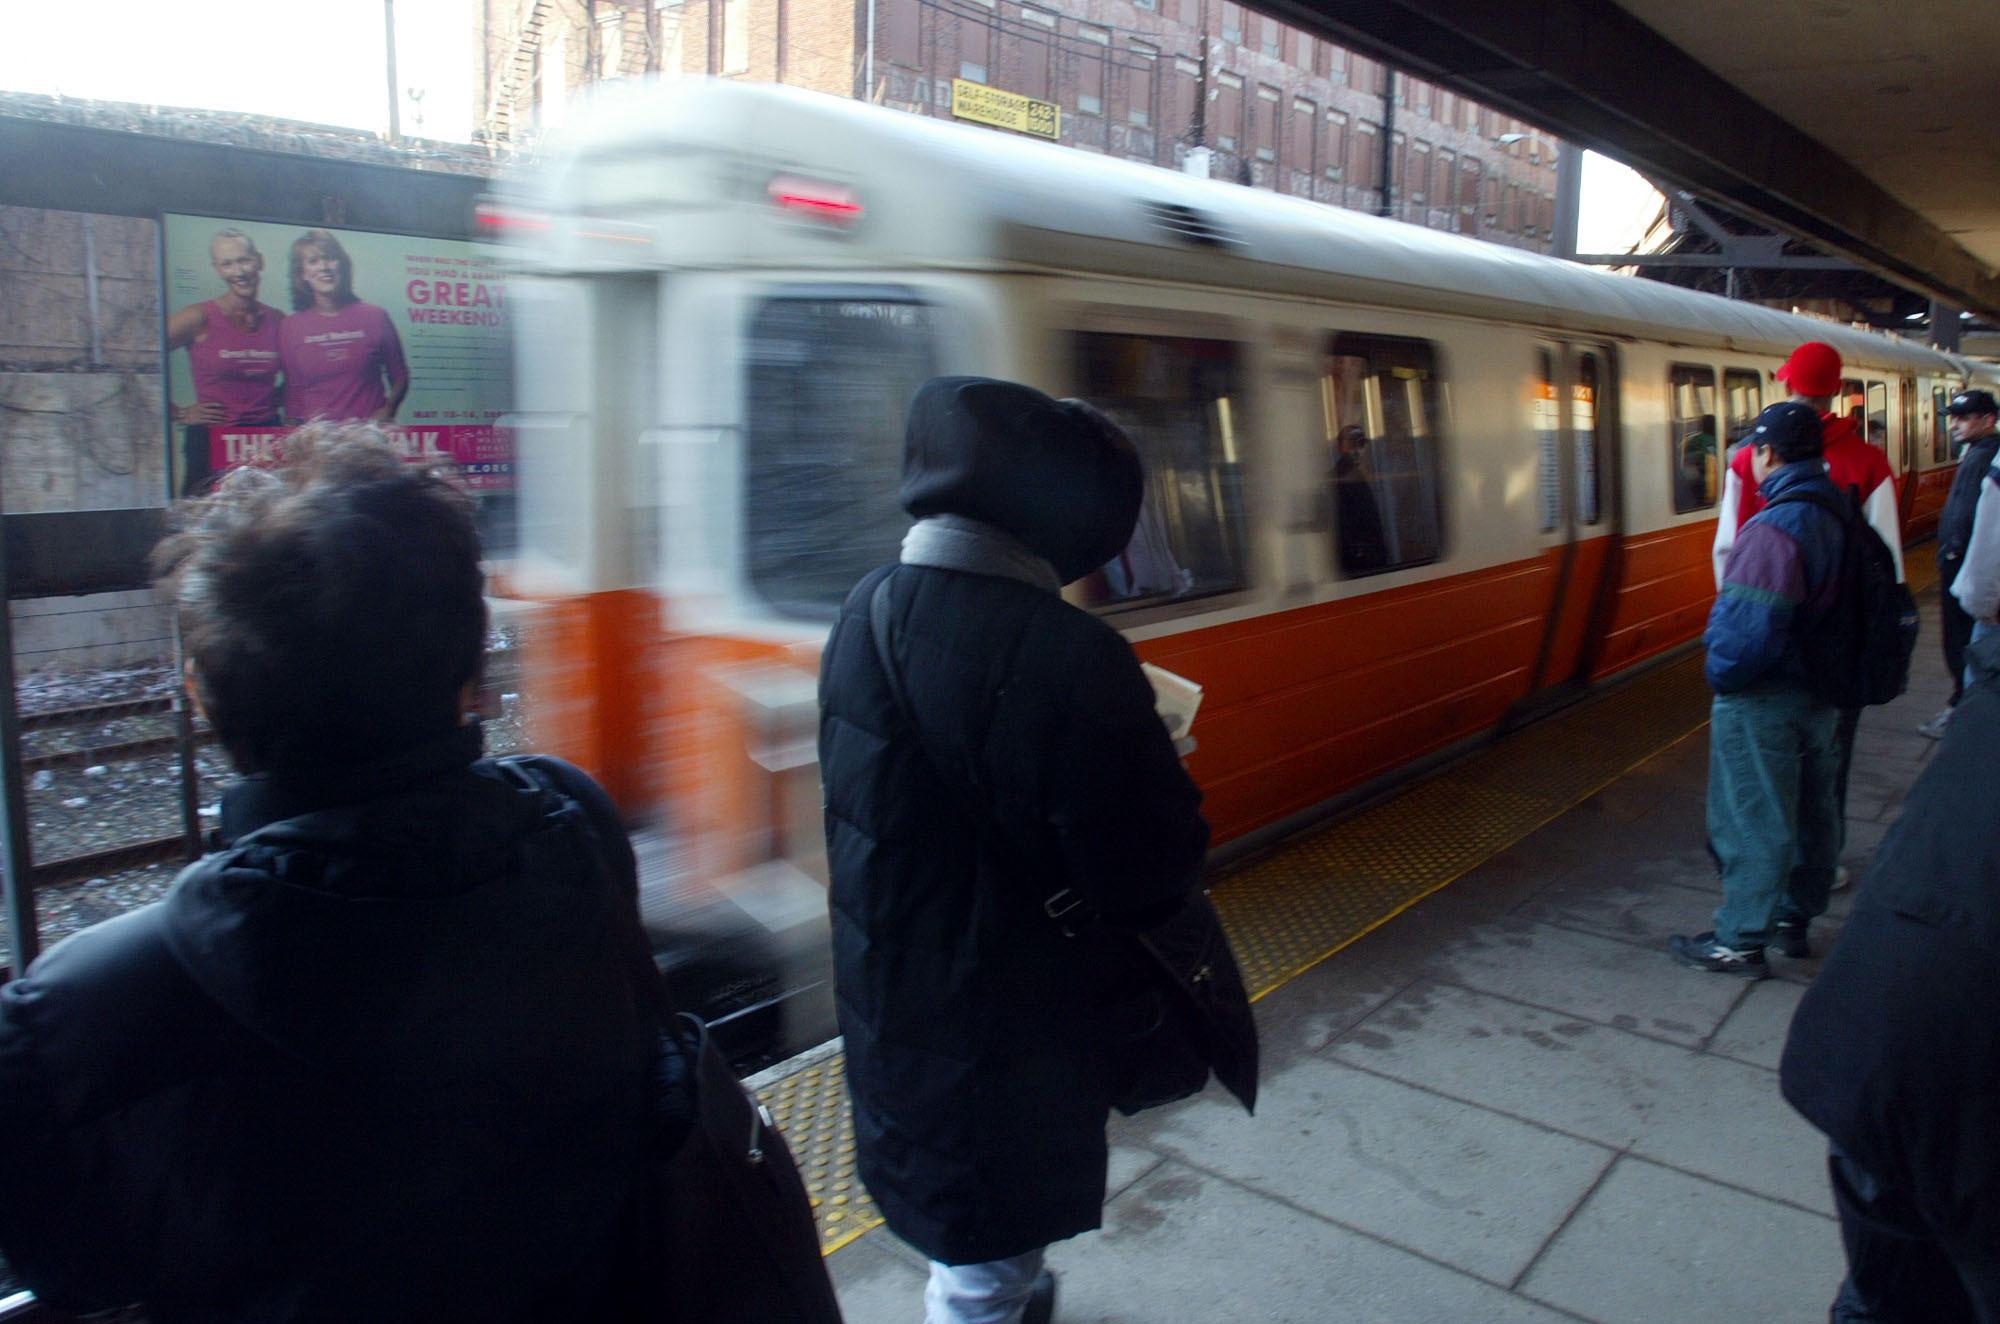 upskirt Boston nude subway